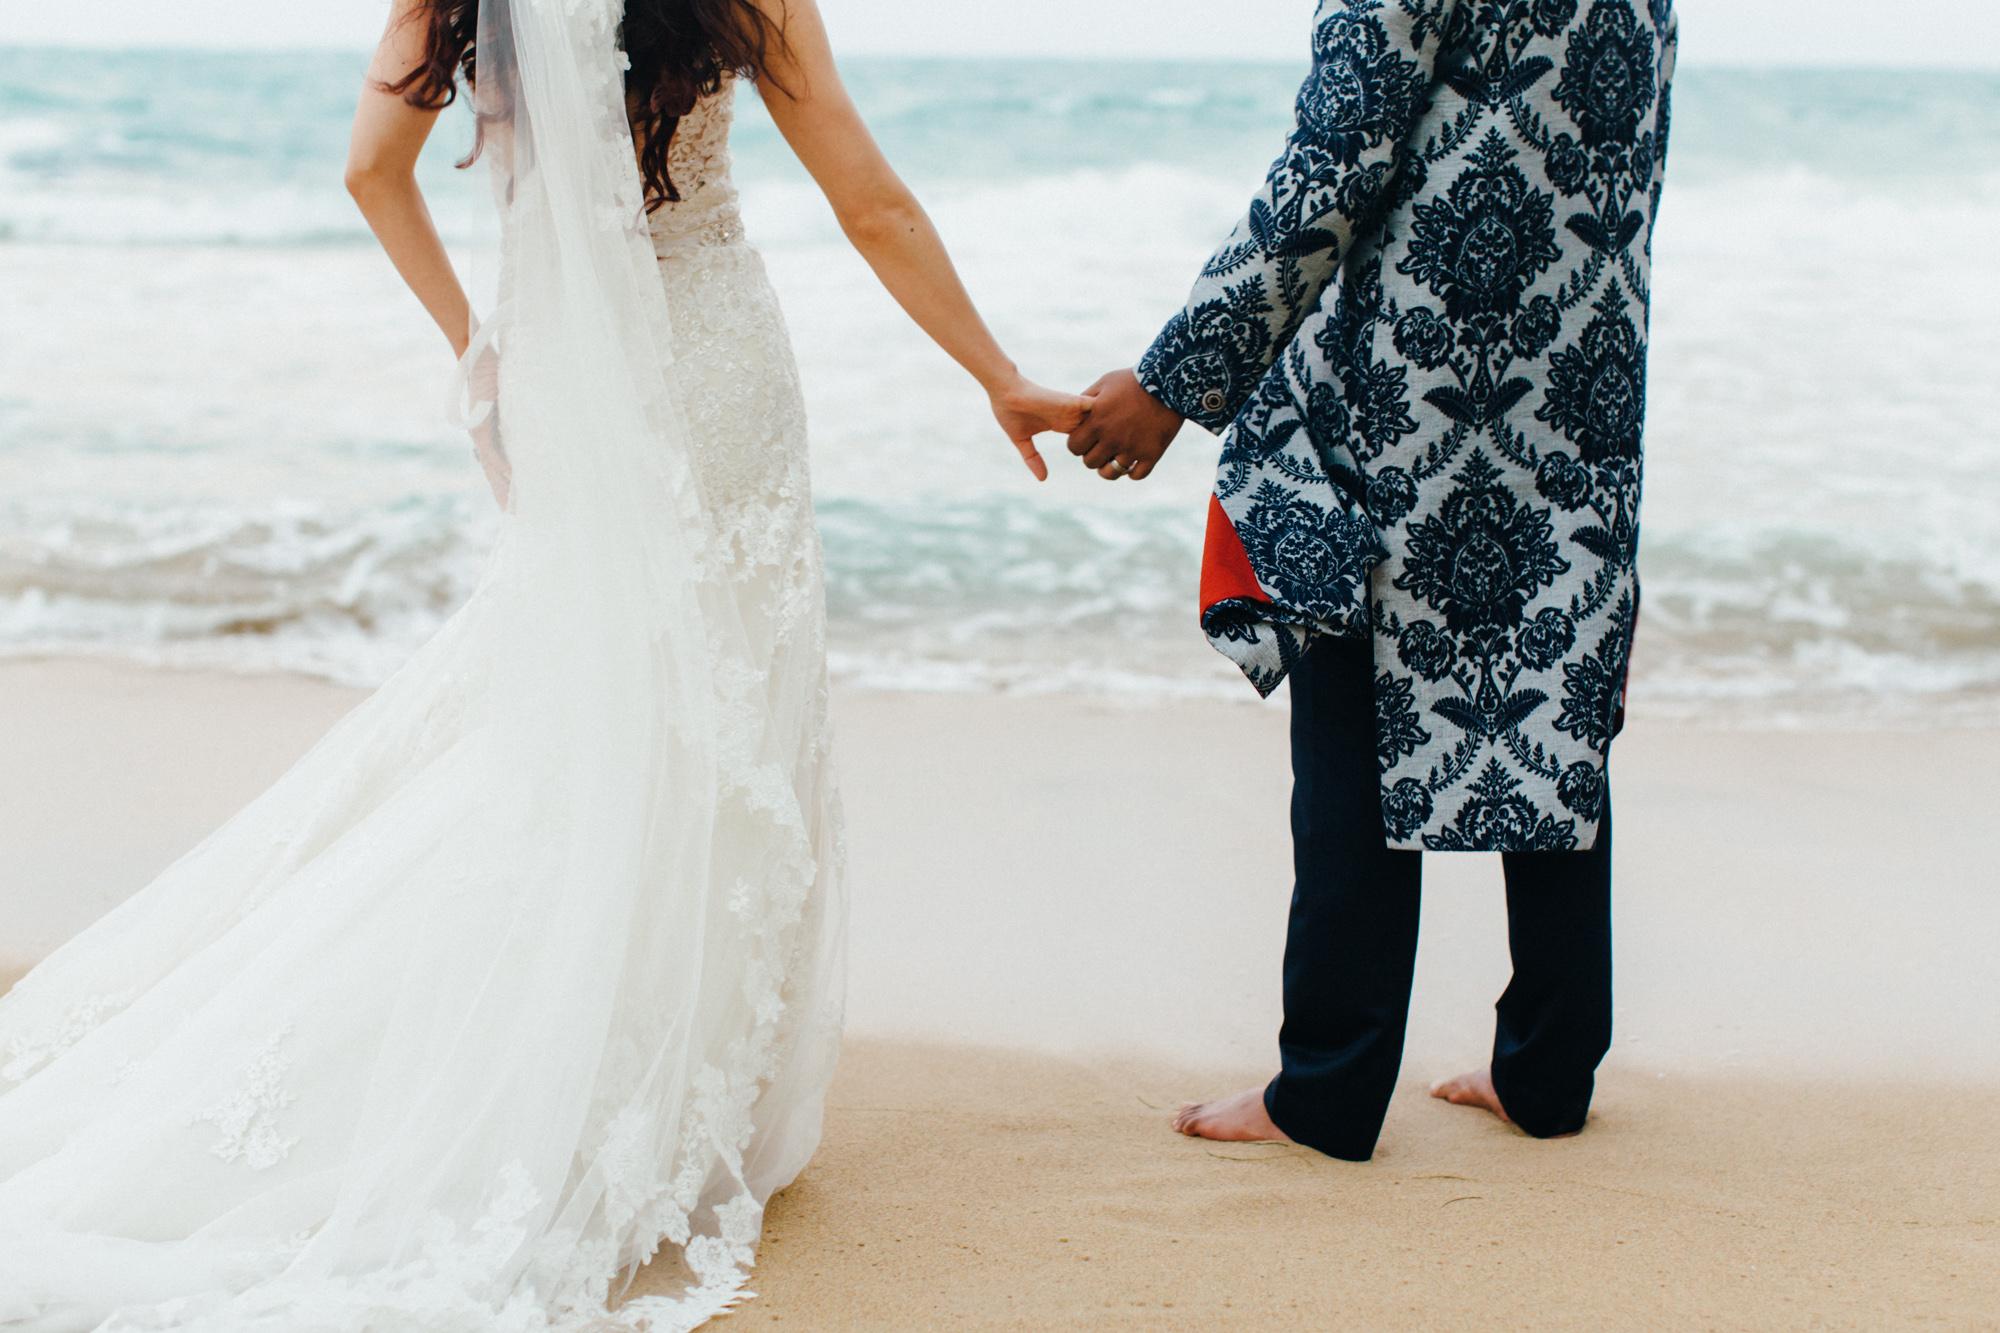 Puerto Rico Wedding Photography Destination Photographer Boris Zaretsky San Juan PR Casino Antiguo La Concha IMG_0595.jpg